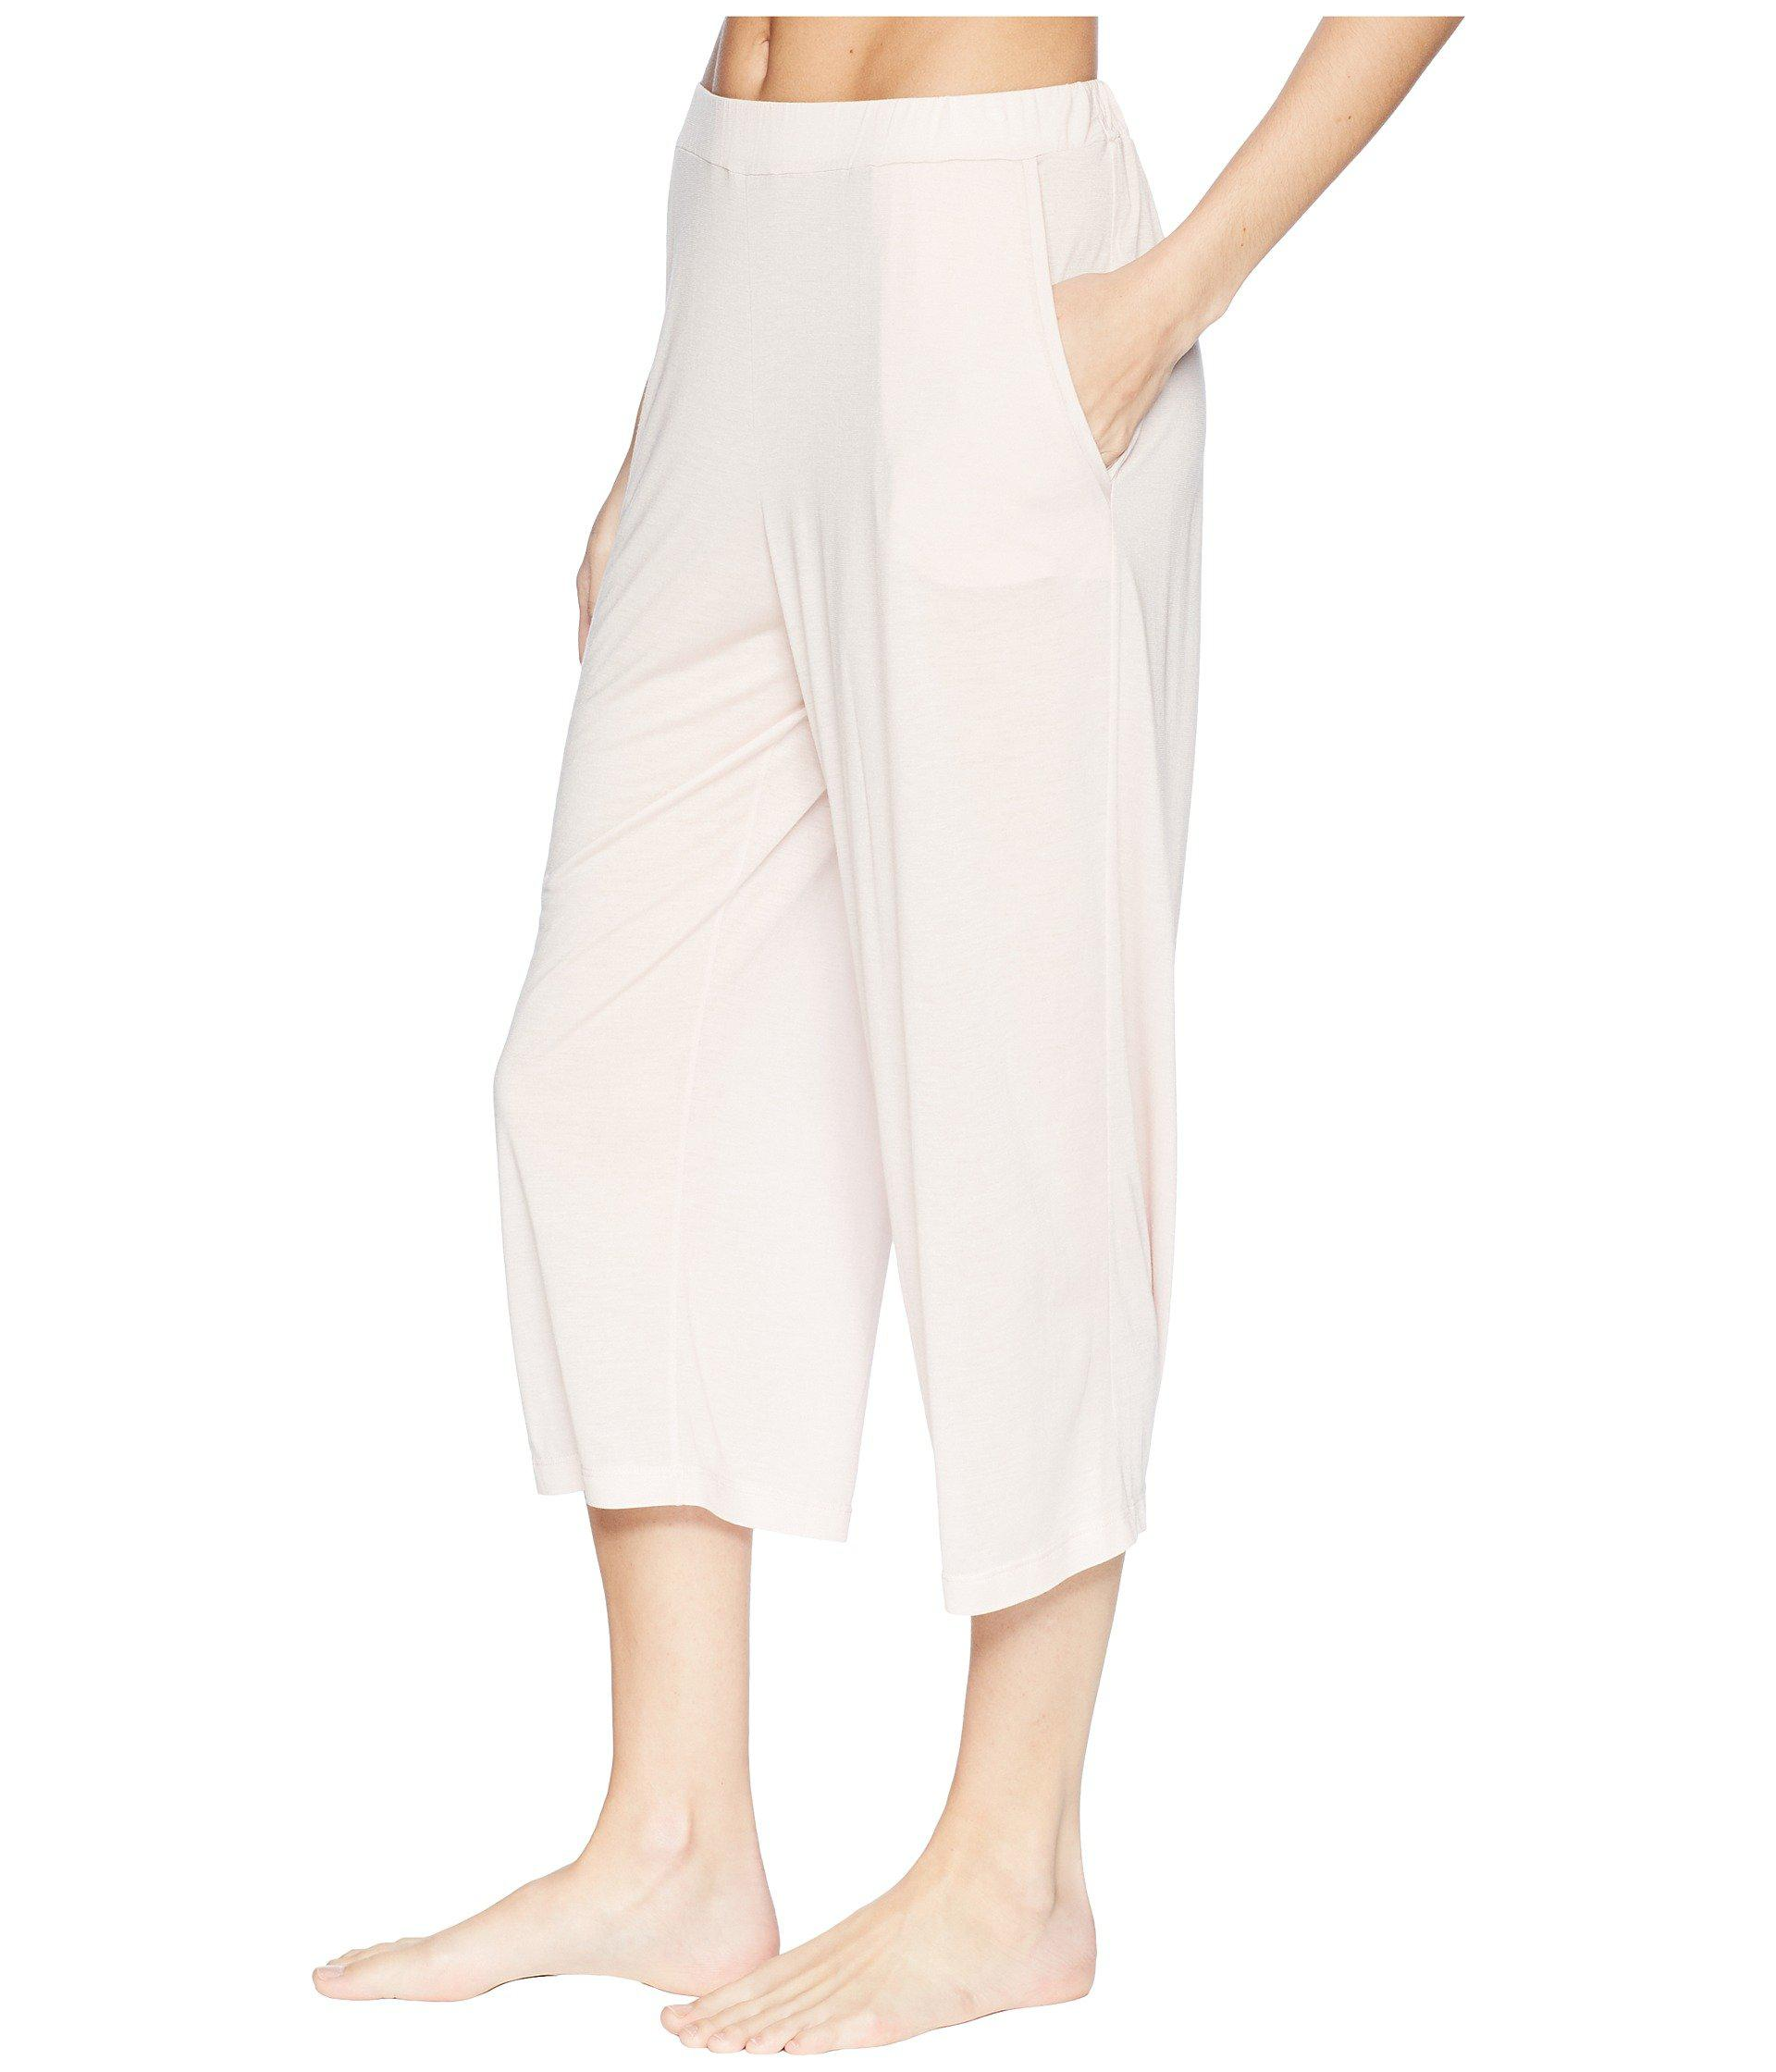 10b9a809b0 Lyst - Hanro Malva Crop Pants in Pink - Save 36.231884057971016%